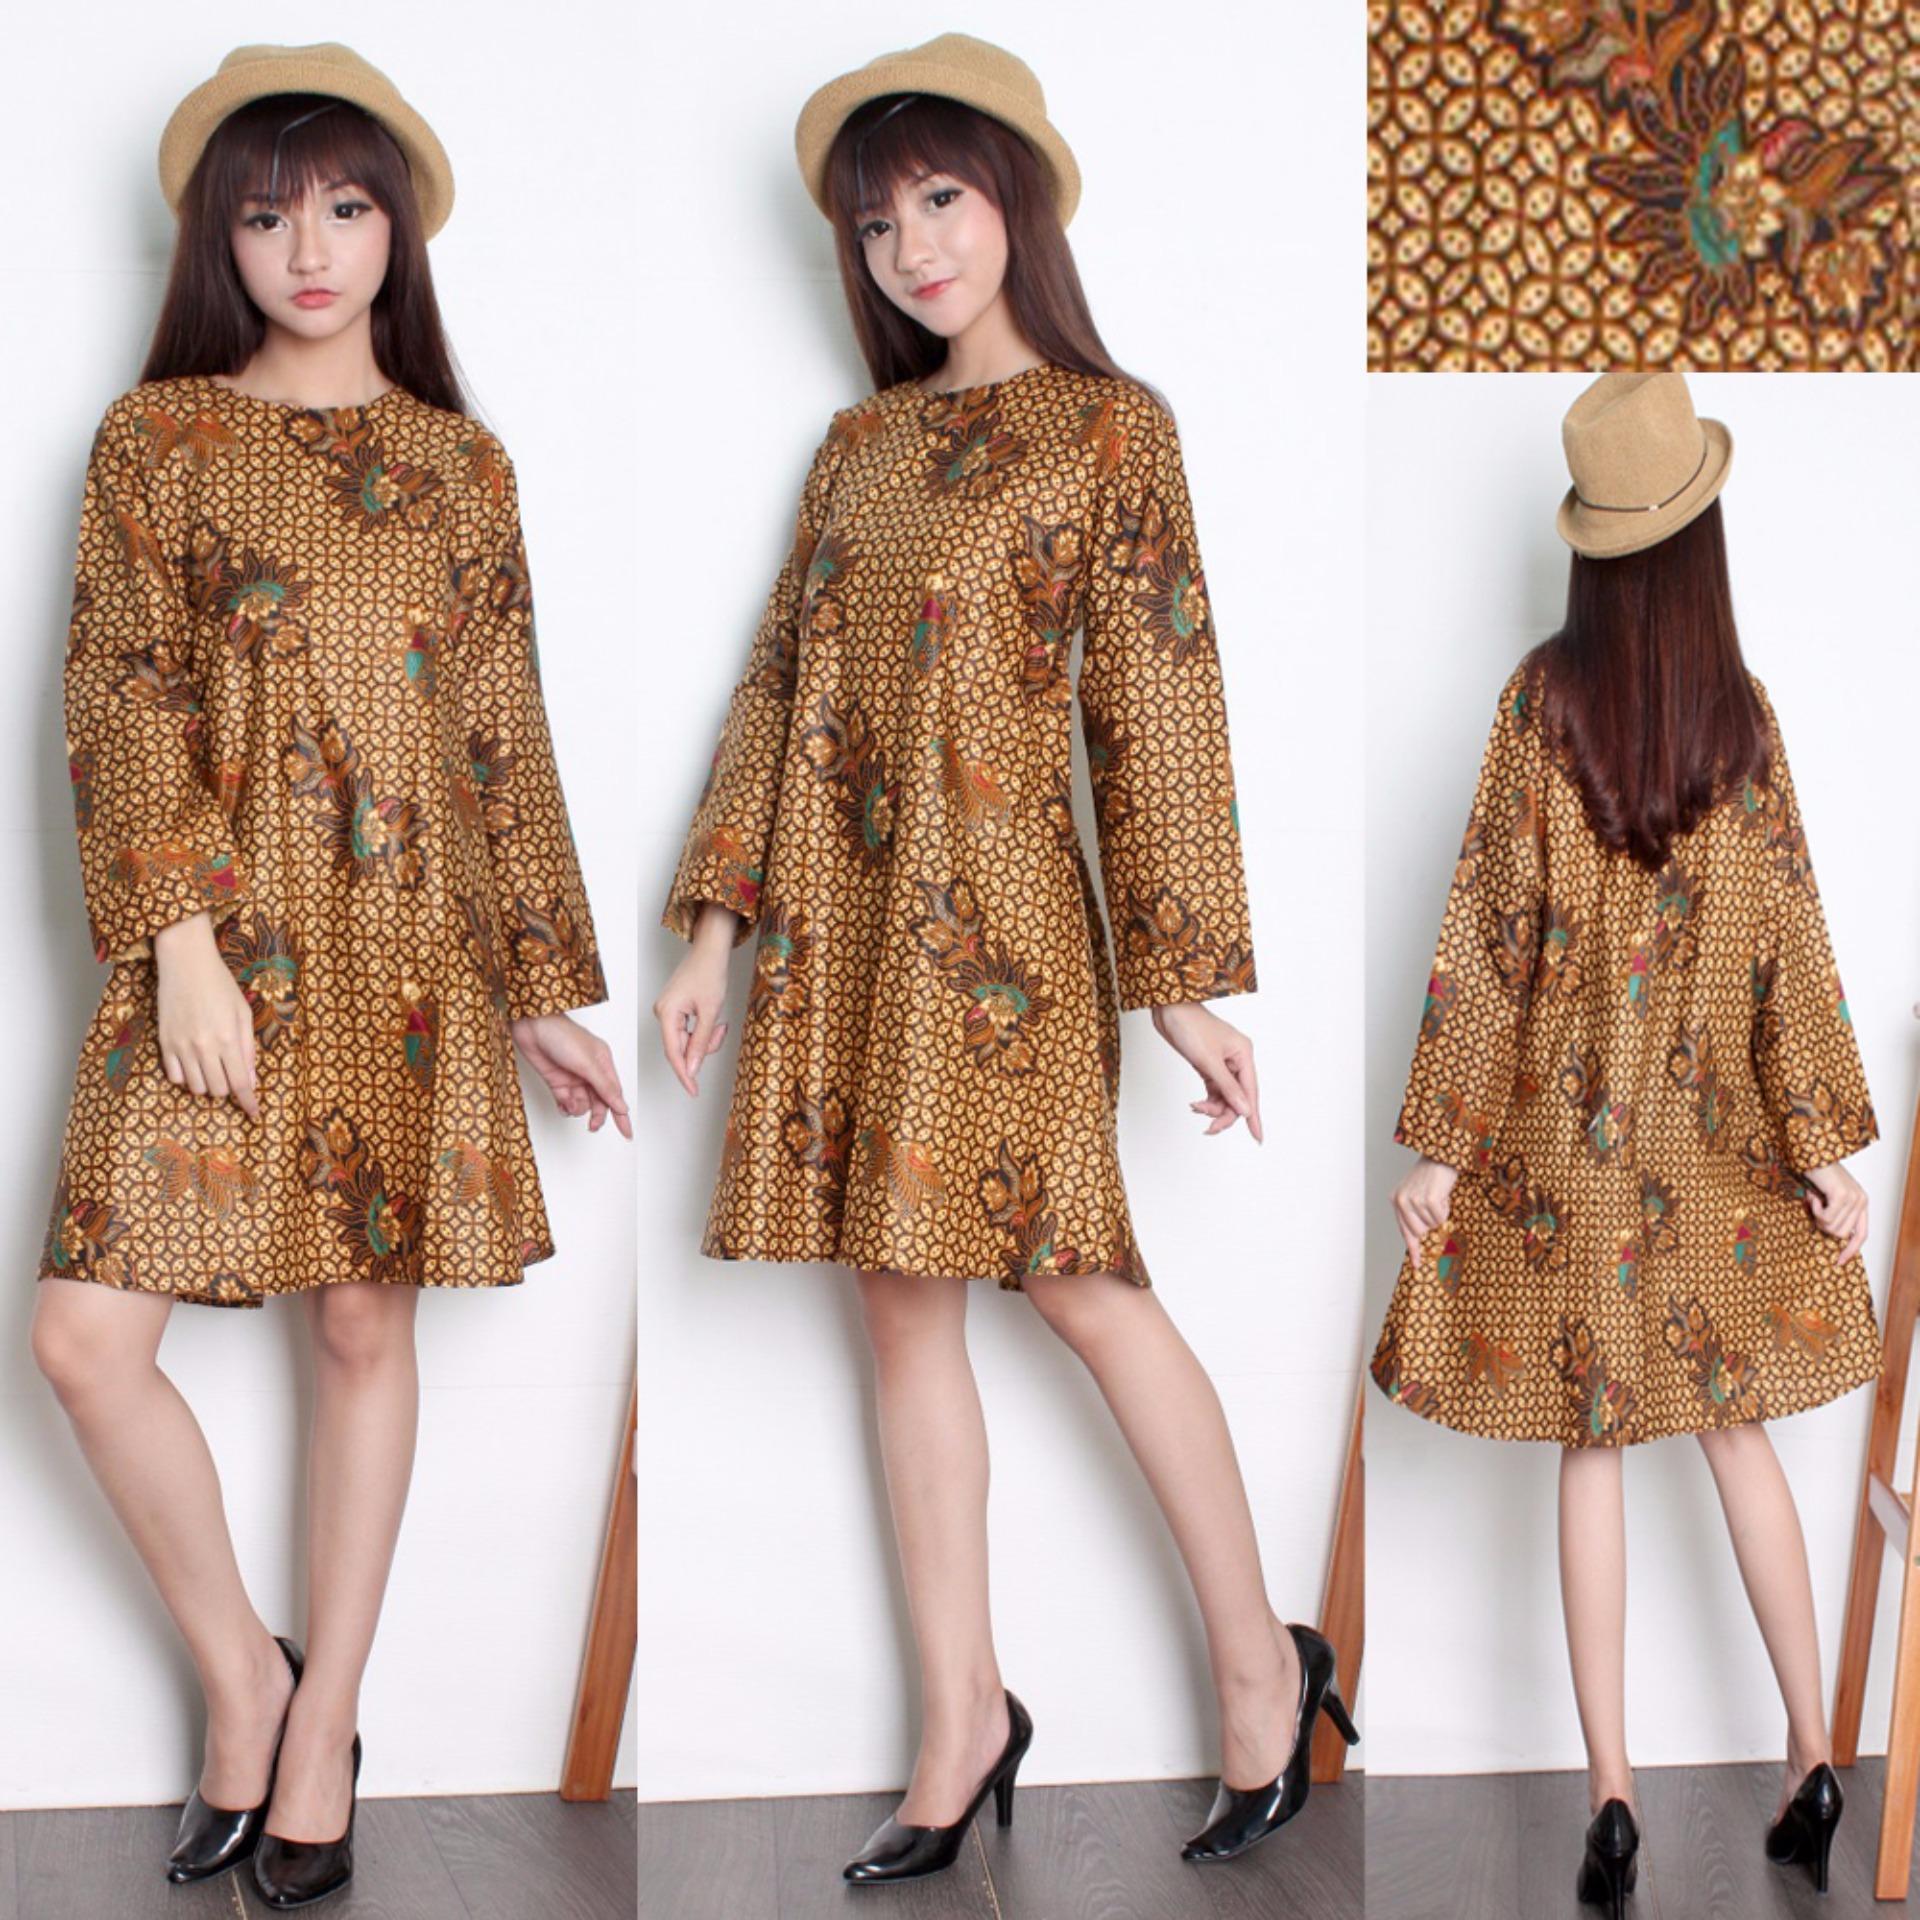 SB Collection Atasan Tunik Sari Blouse Kemeja Wanita Batik - Coklat